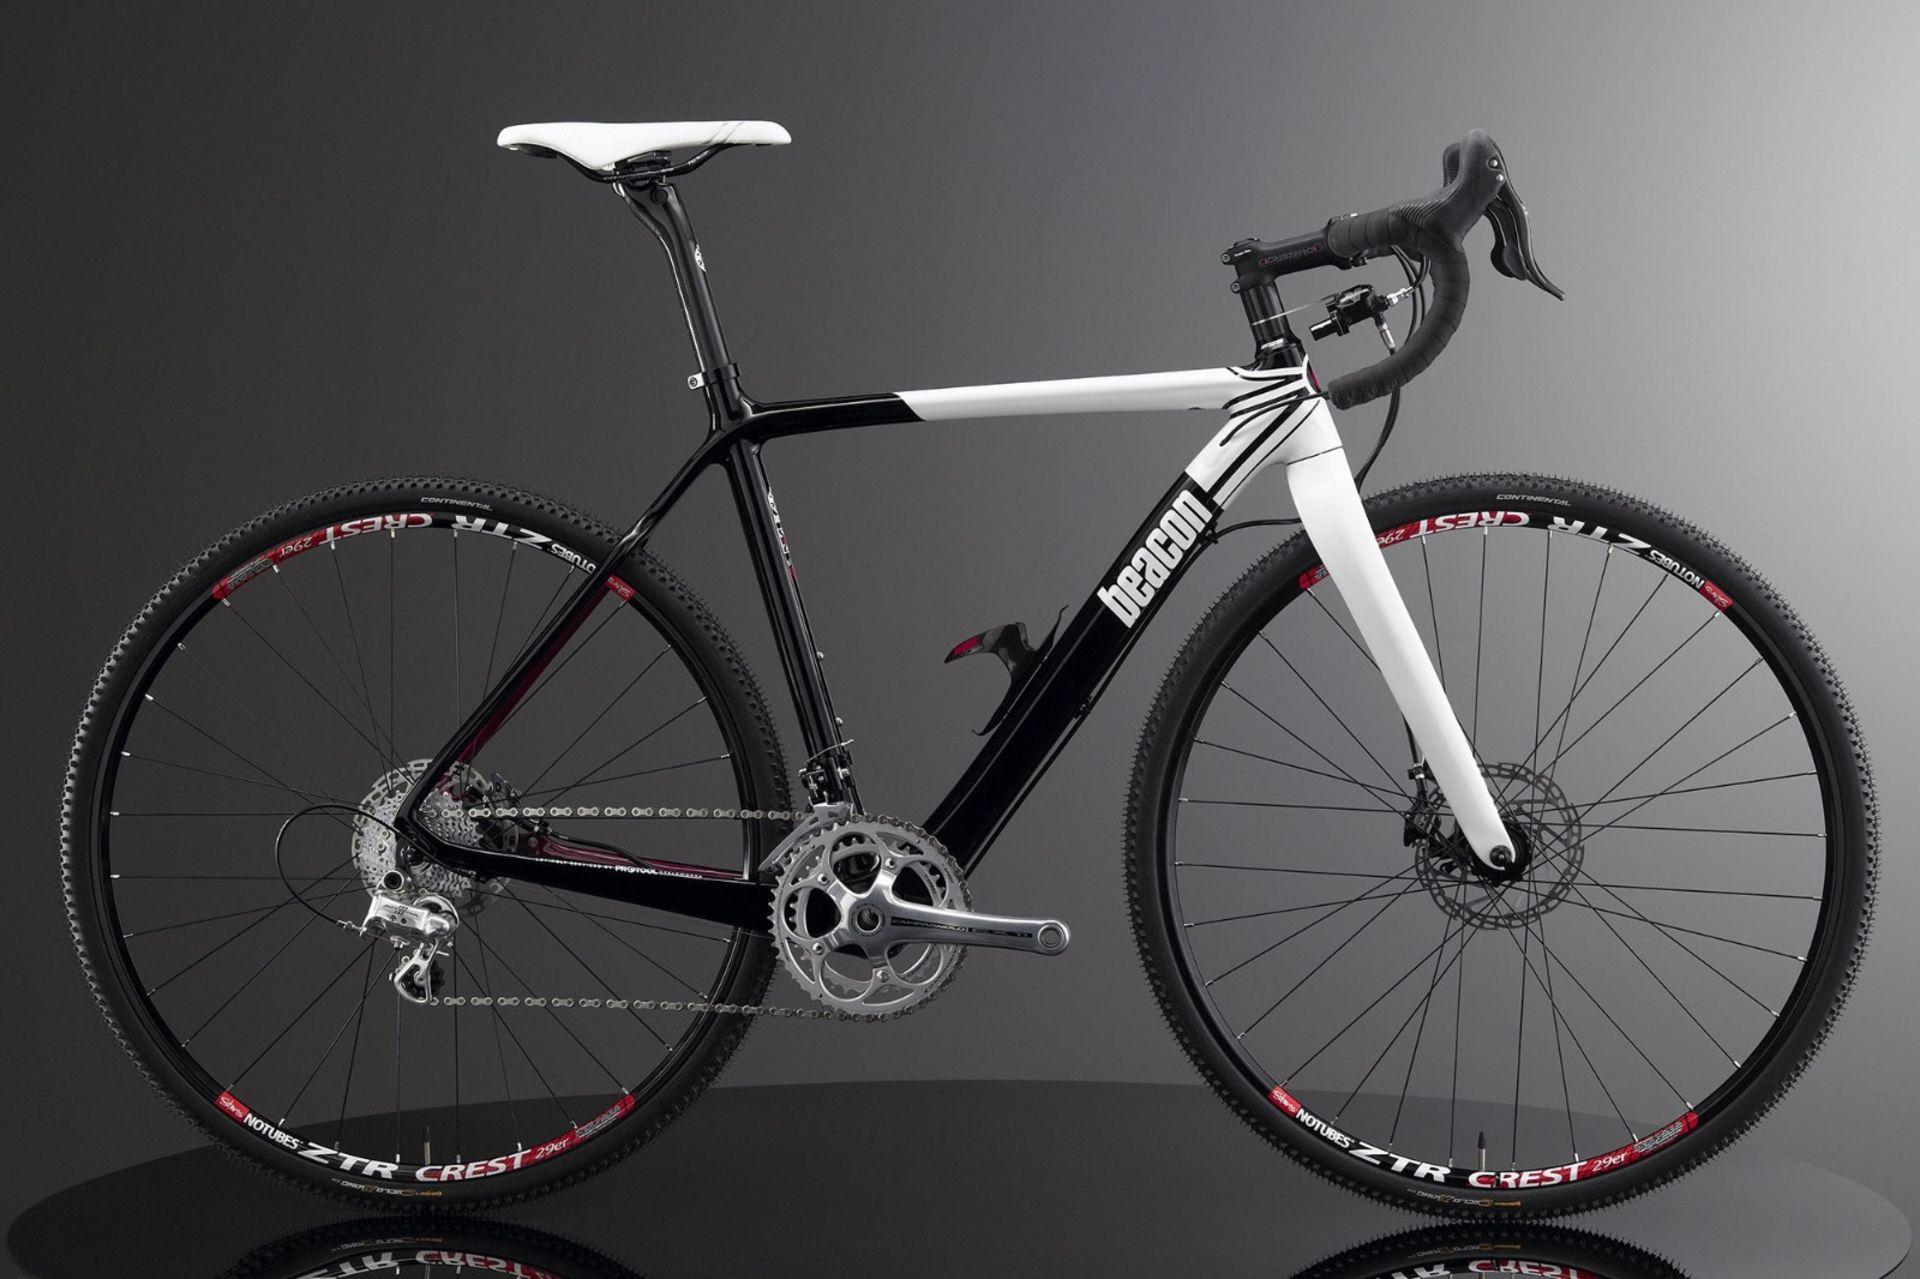 Lot 43 - 1 x Beacon Model BF-45, Size 580, Carbon Fibre Bike Frame in Black & White.